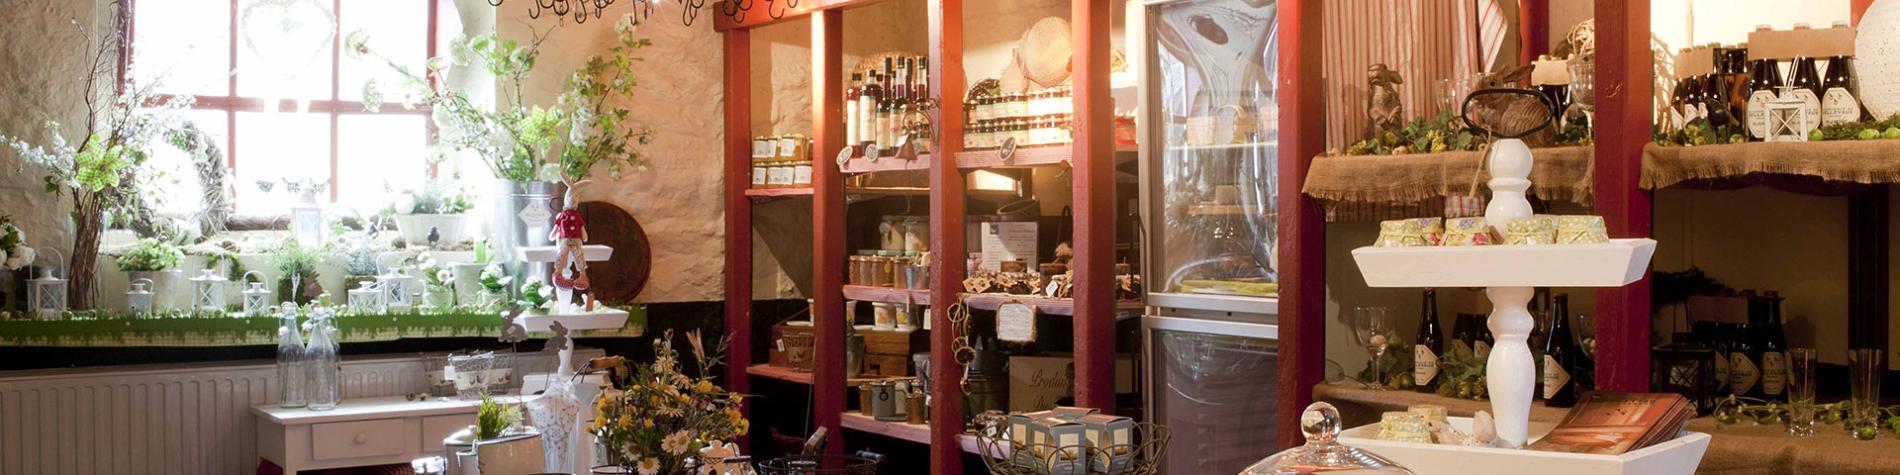 Brasserie de Bellevaux interior